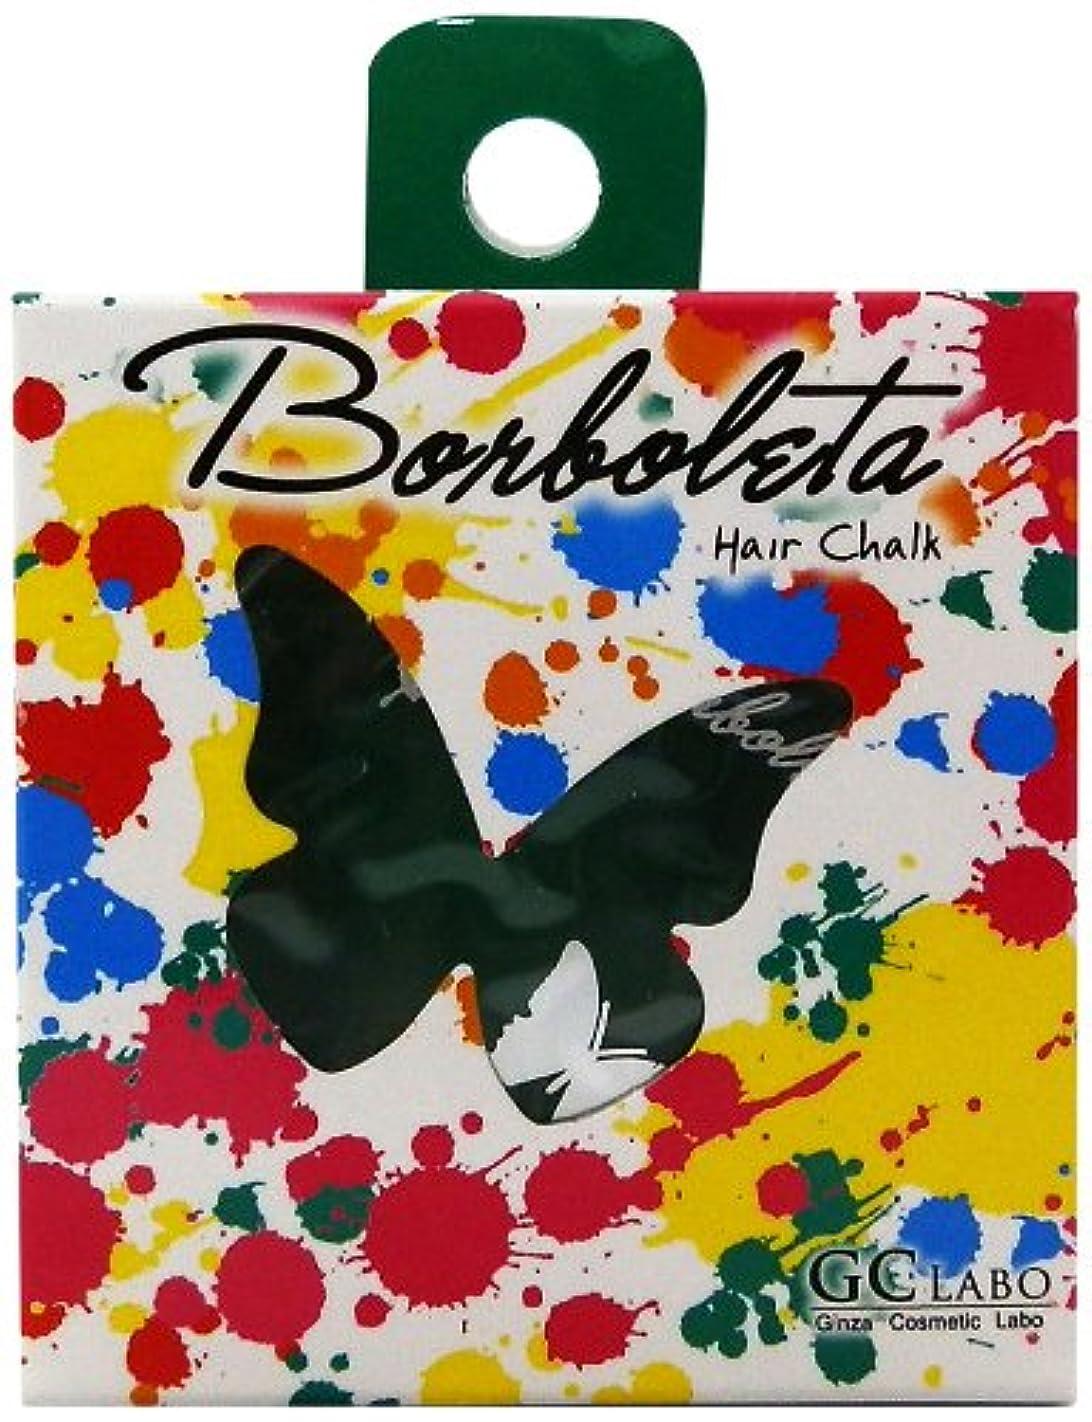 BorBoLeta(ボルボレッタ)ヘアカラーチョーク グリーン